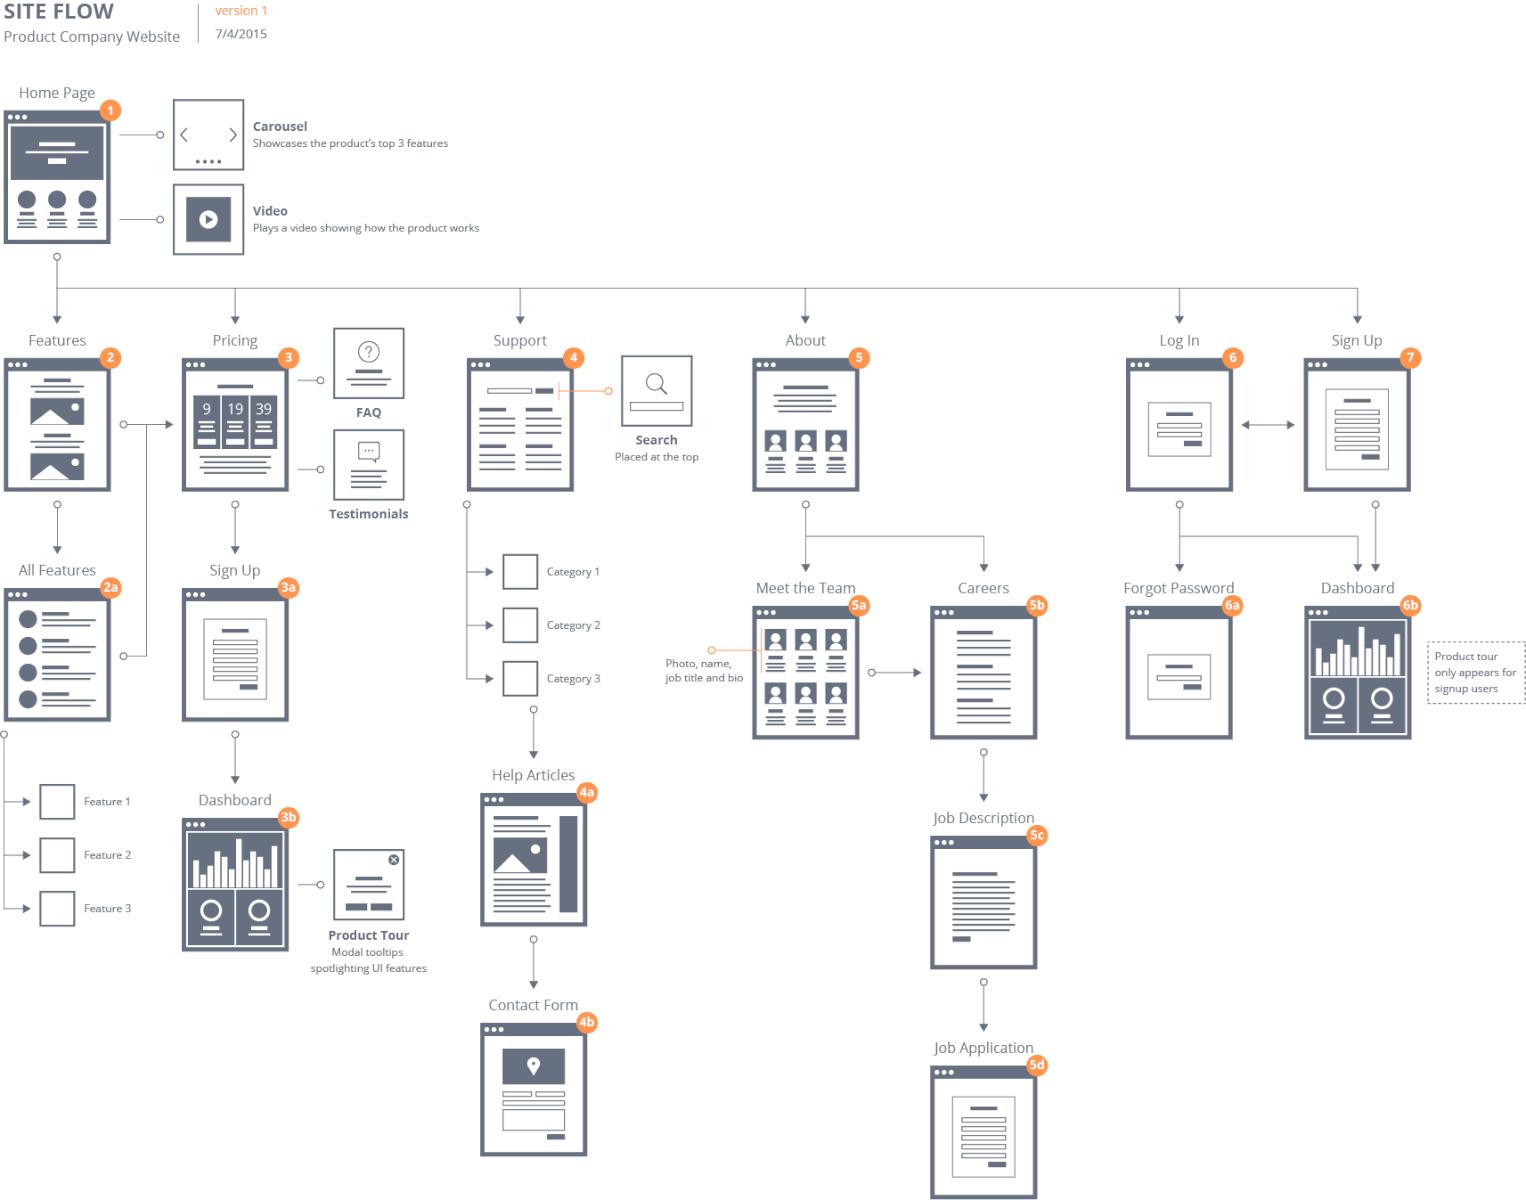 Image Result For Site Flow